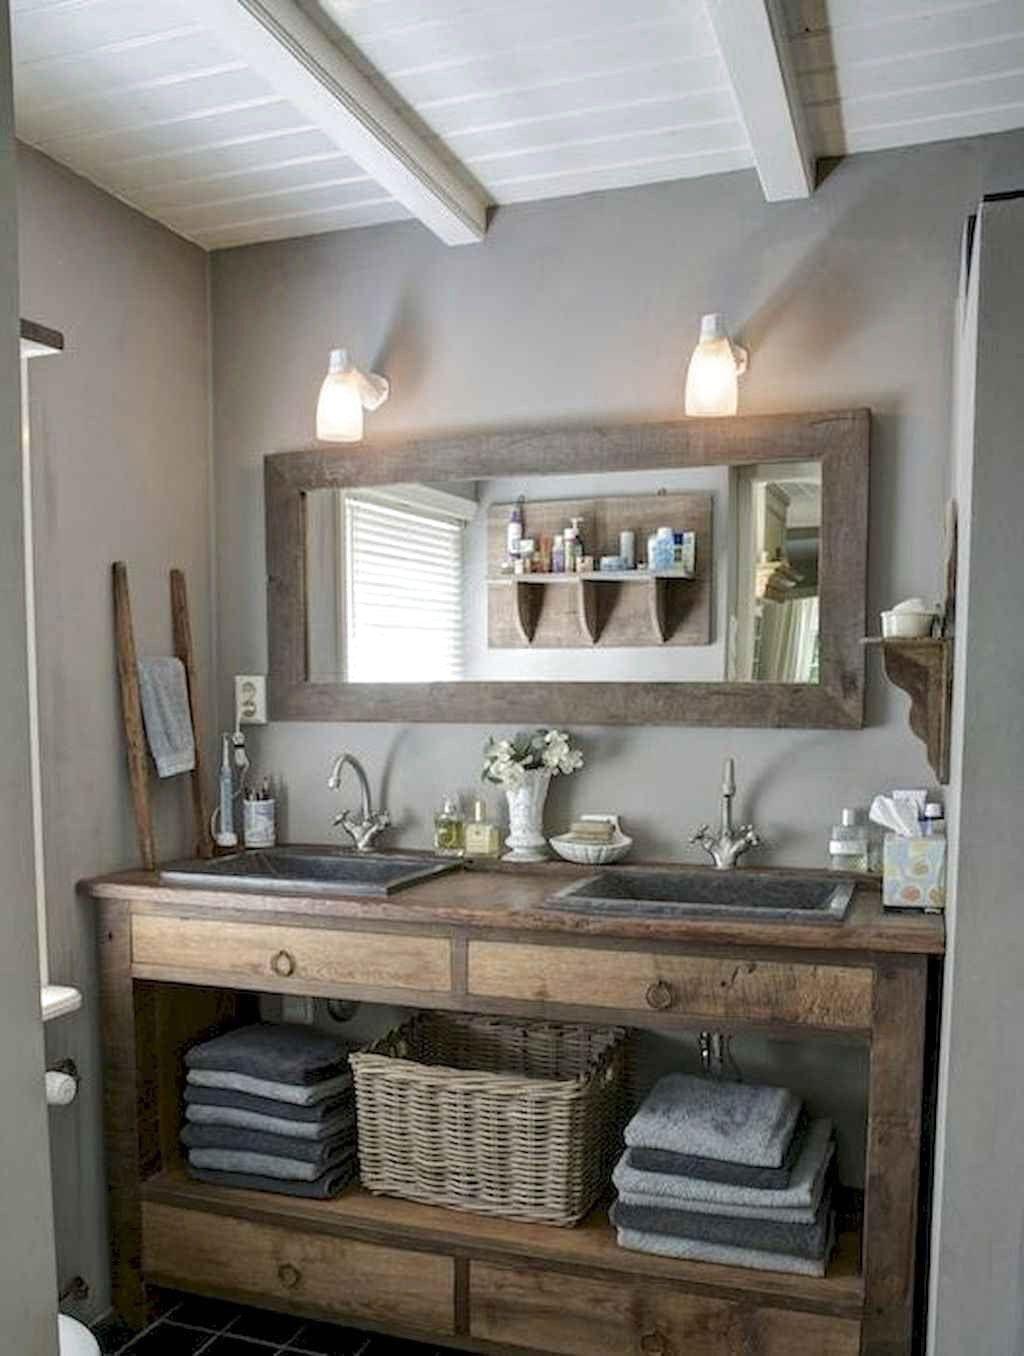 #Amazing #Bathroom #Decor #Farmhouse #FarmhouseBathroom - My Blog - My Blog